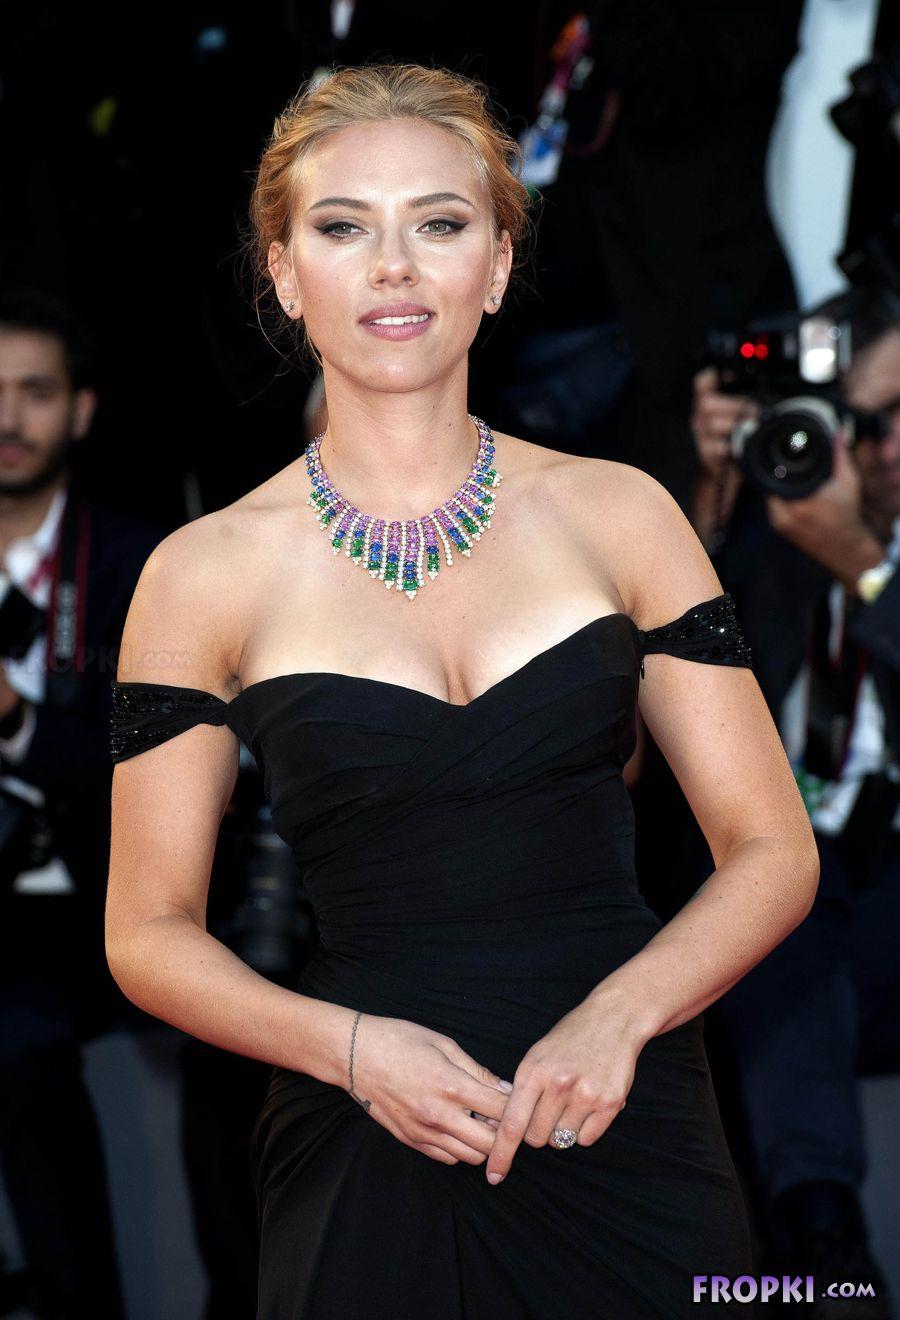 Scarlett Johansson Fropki 20